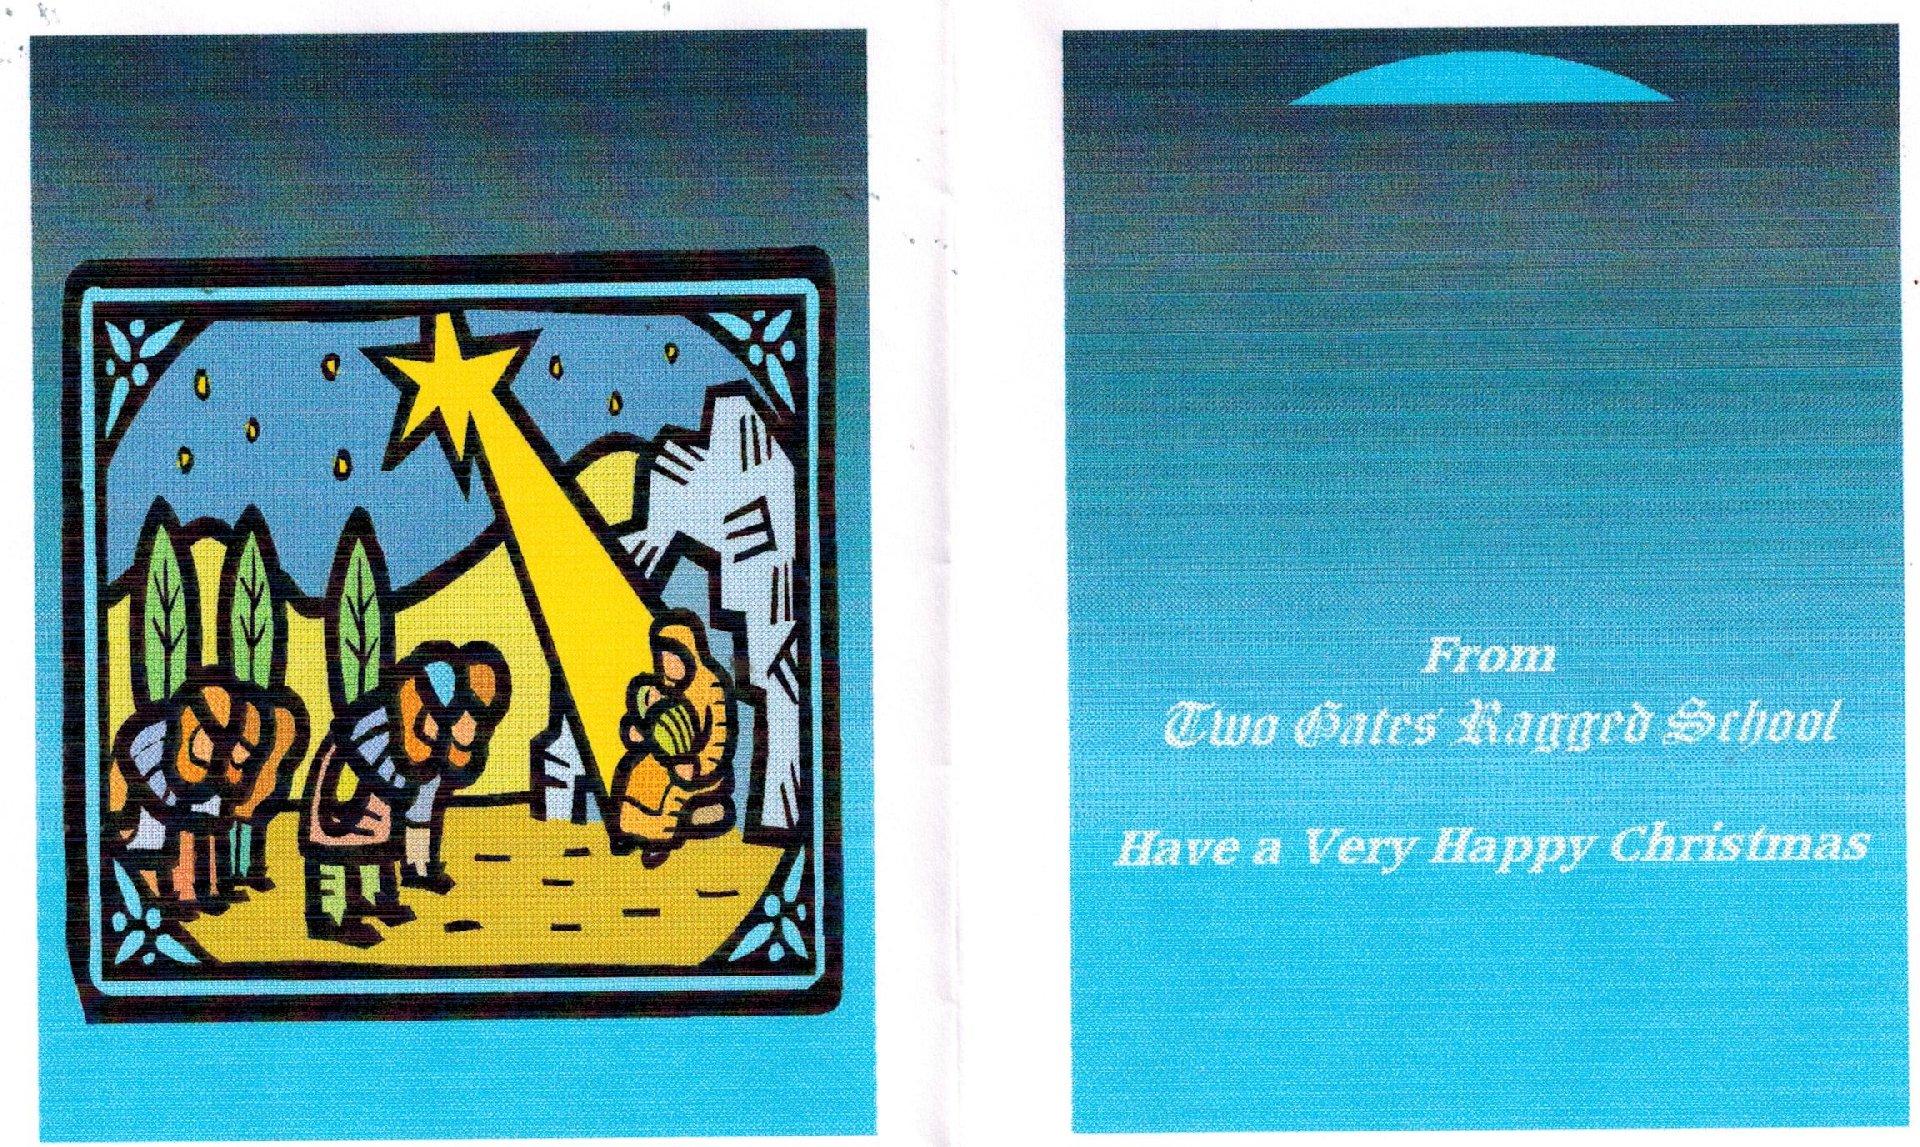 J086a_Xmas-wishes[Dec-2000]